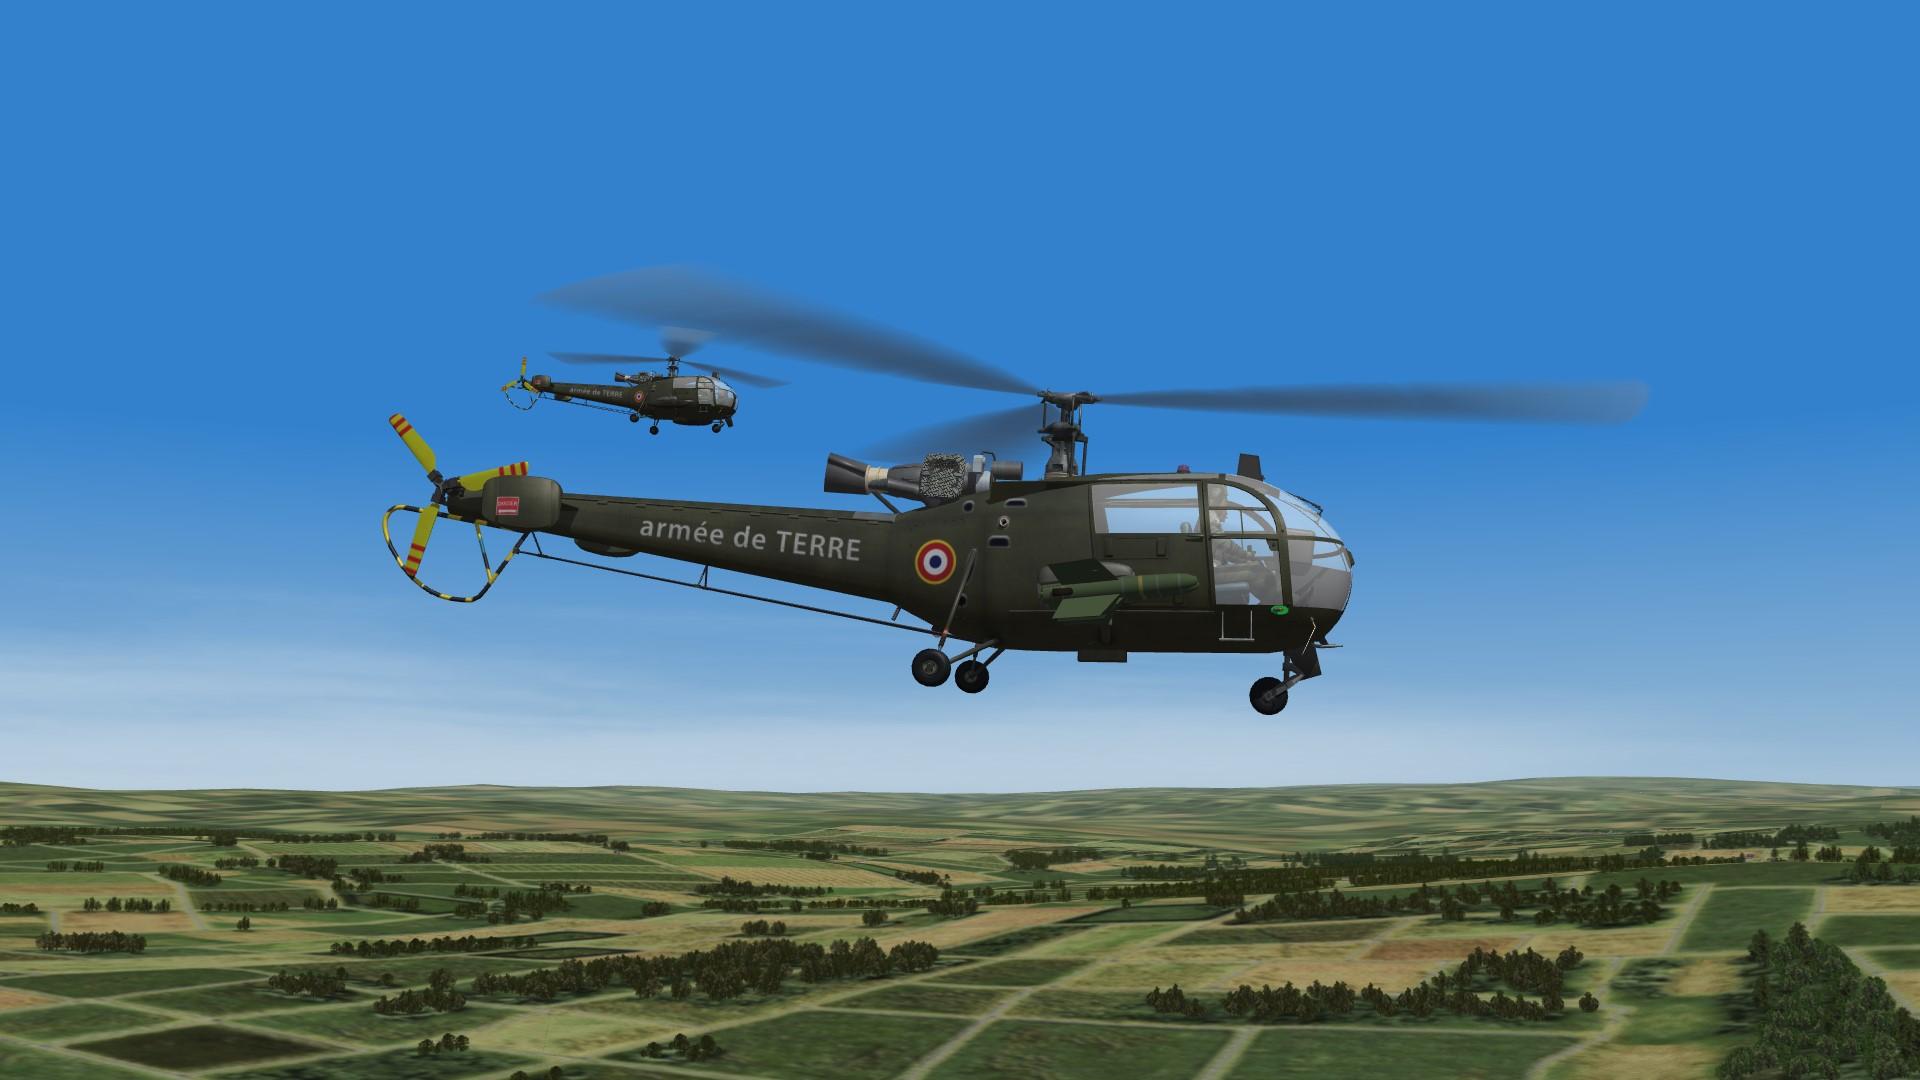 1968 AllouetteIII in CAS mission W.Germany